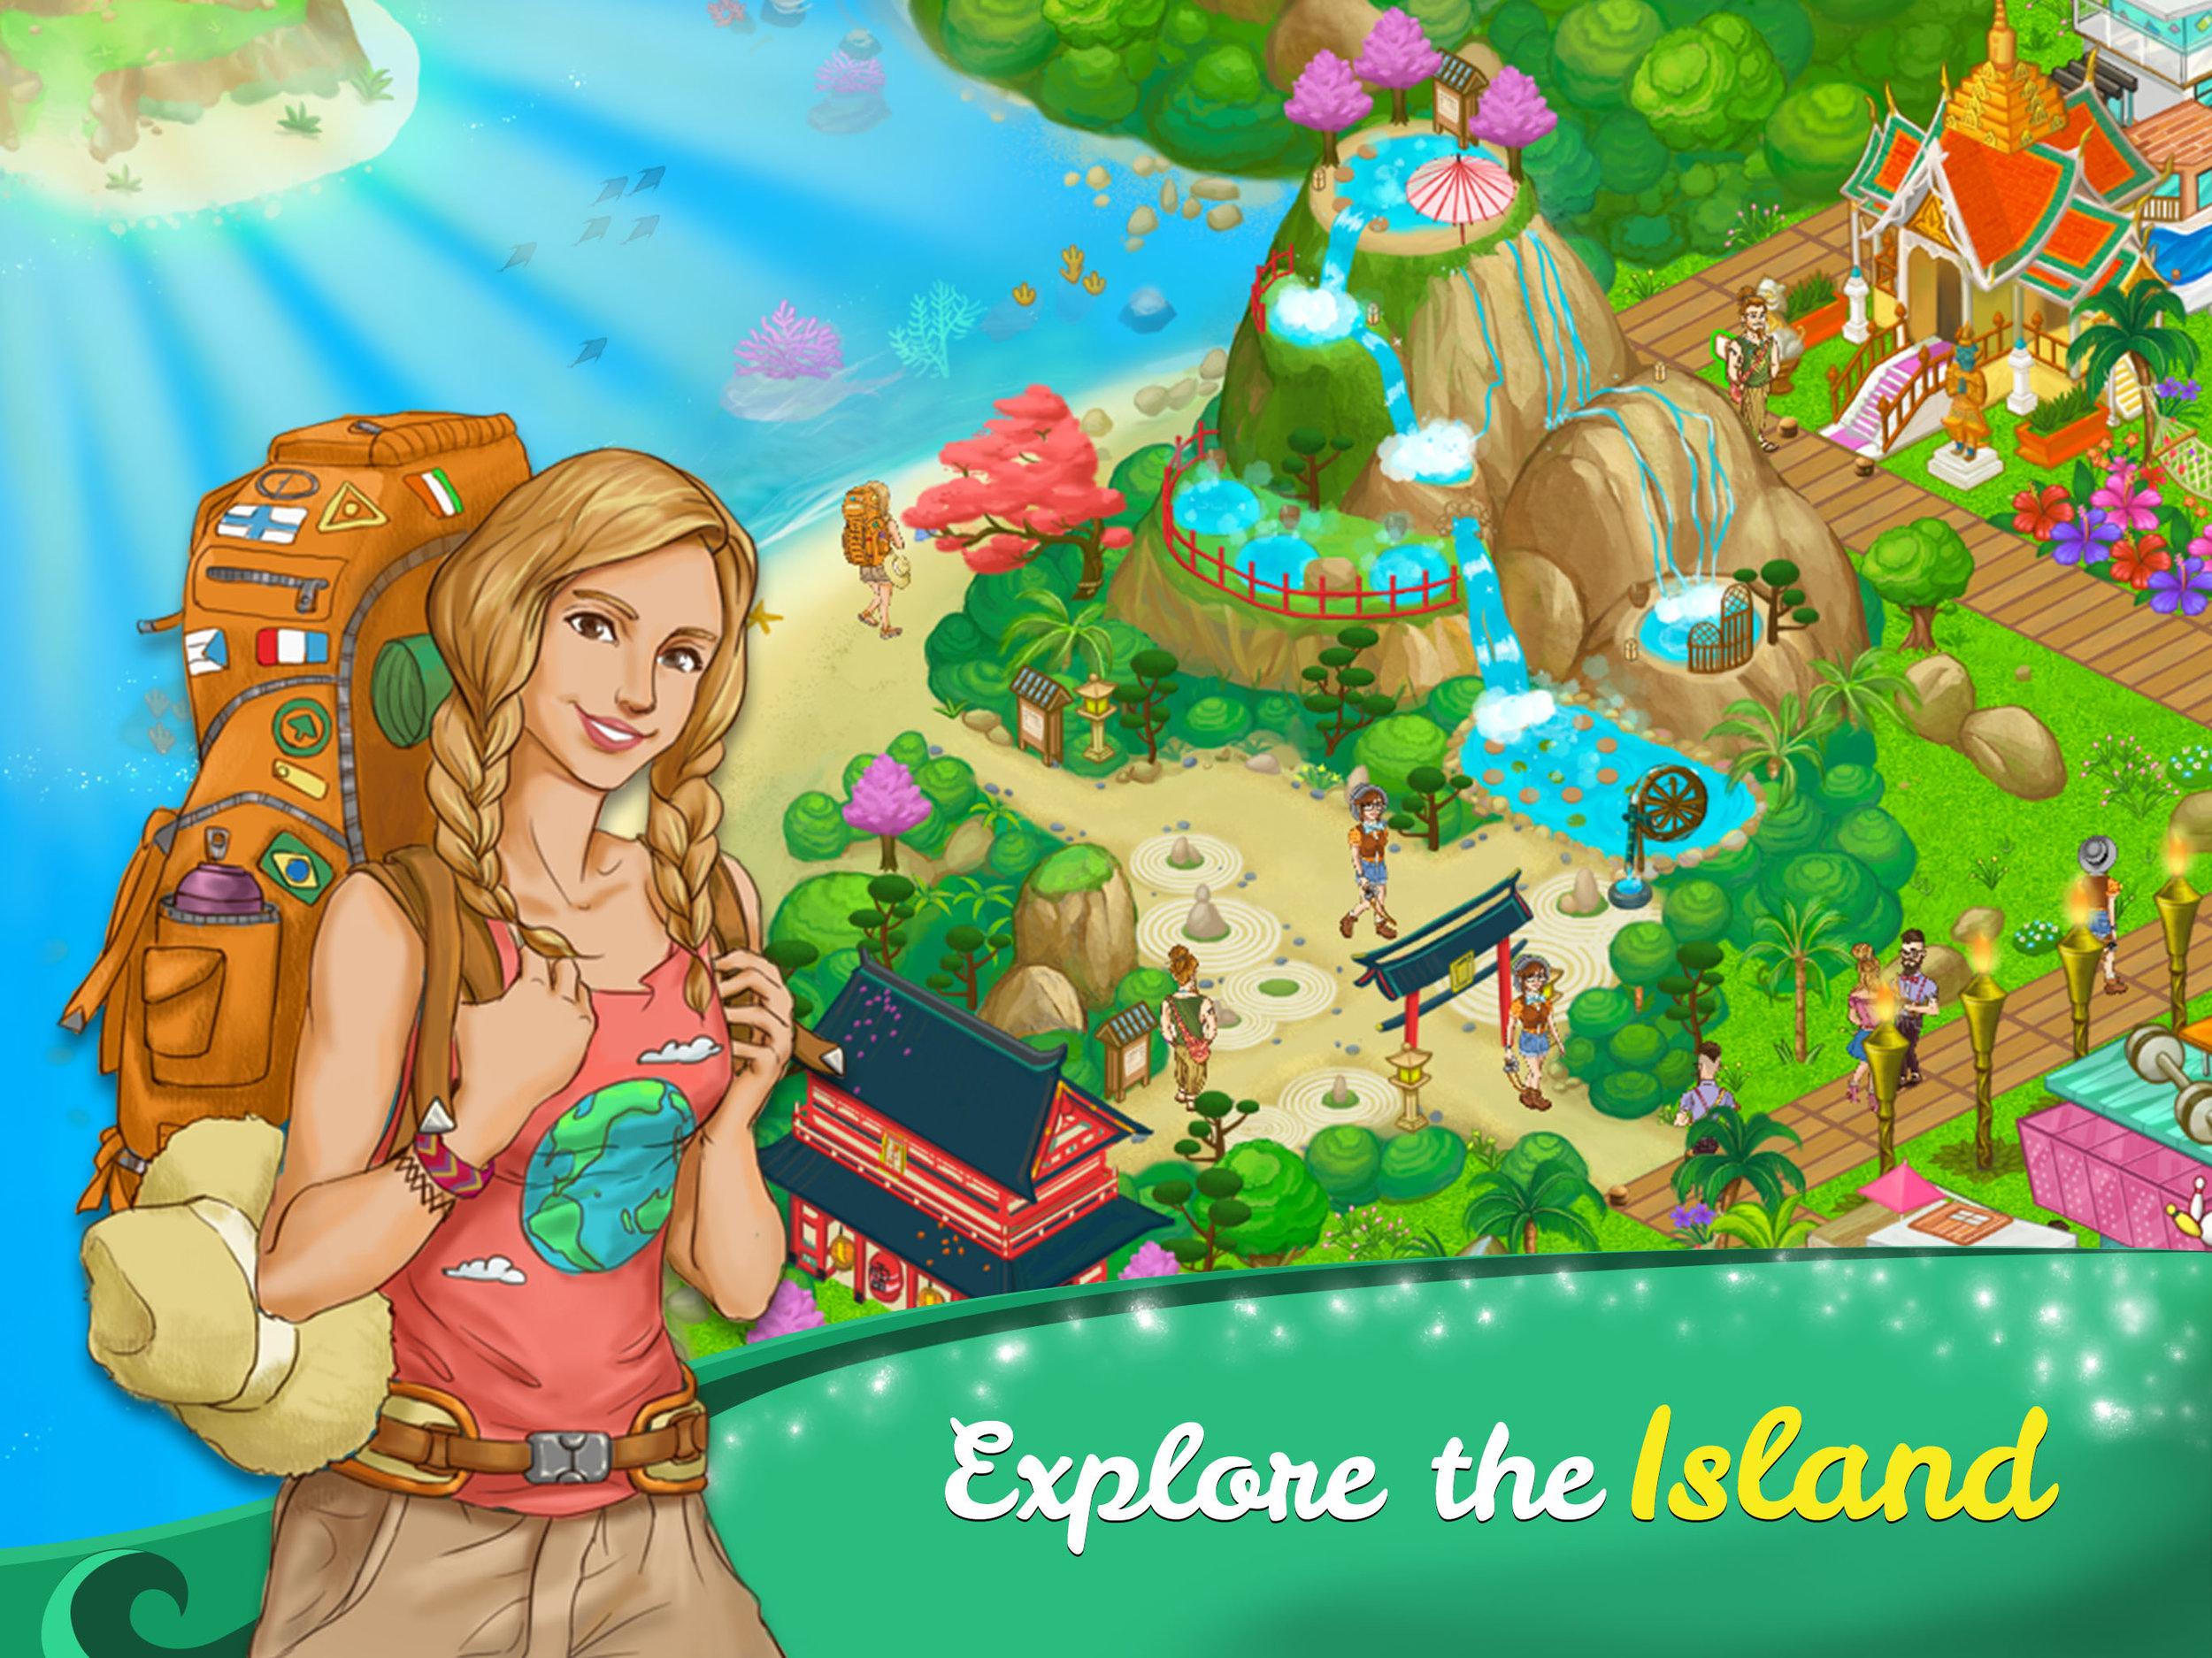 05_explore_the_island_2018_iPad.jpg